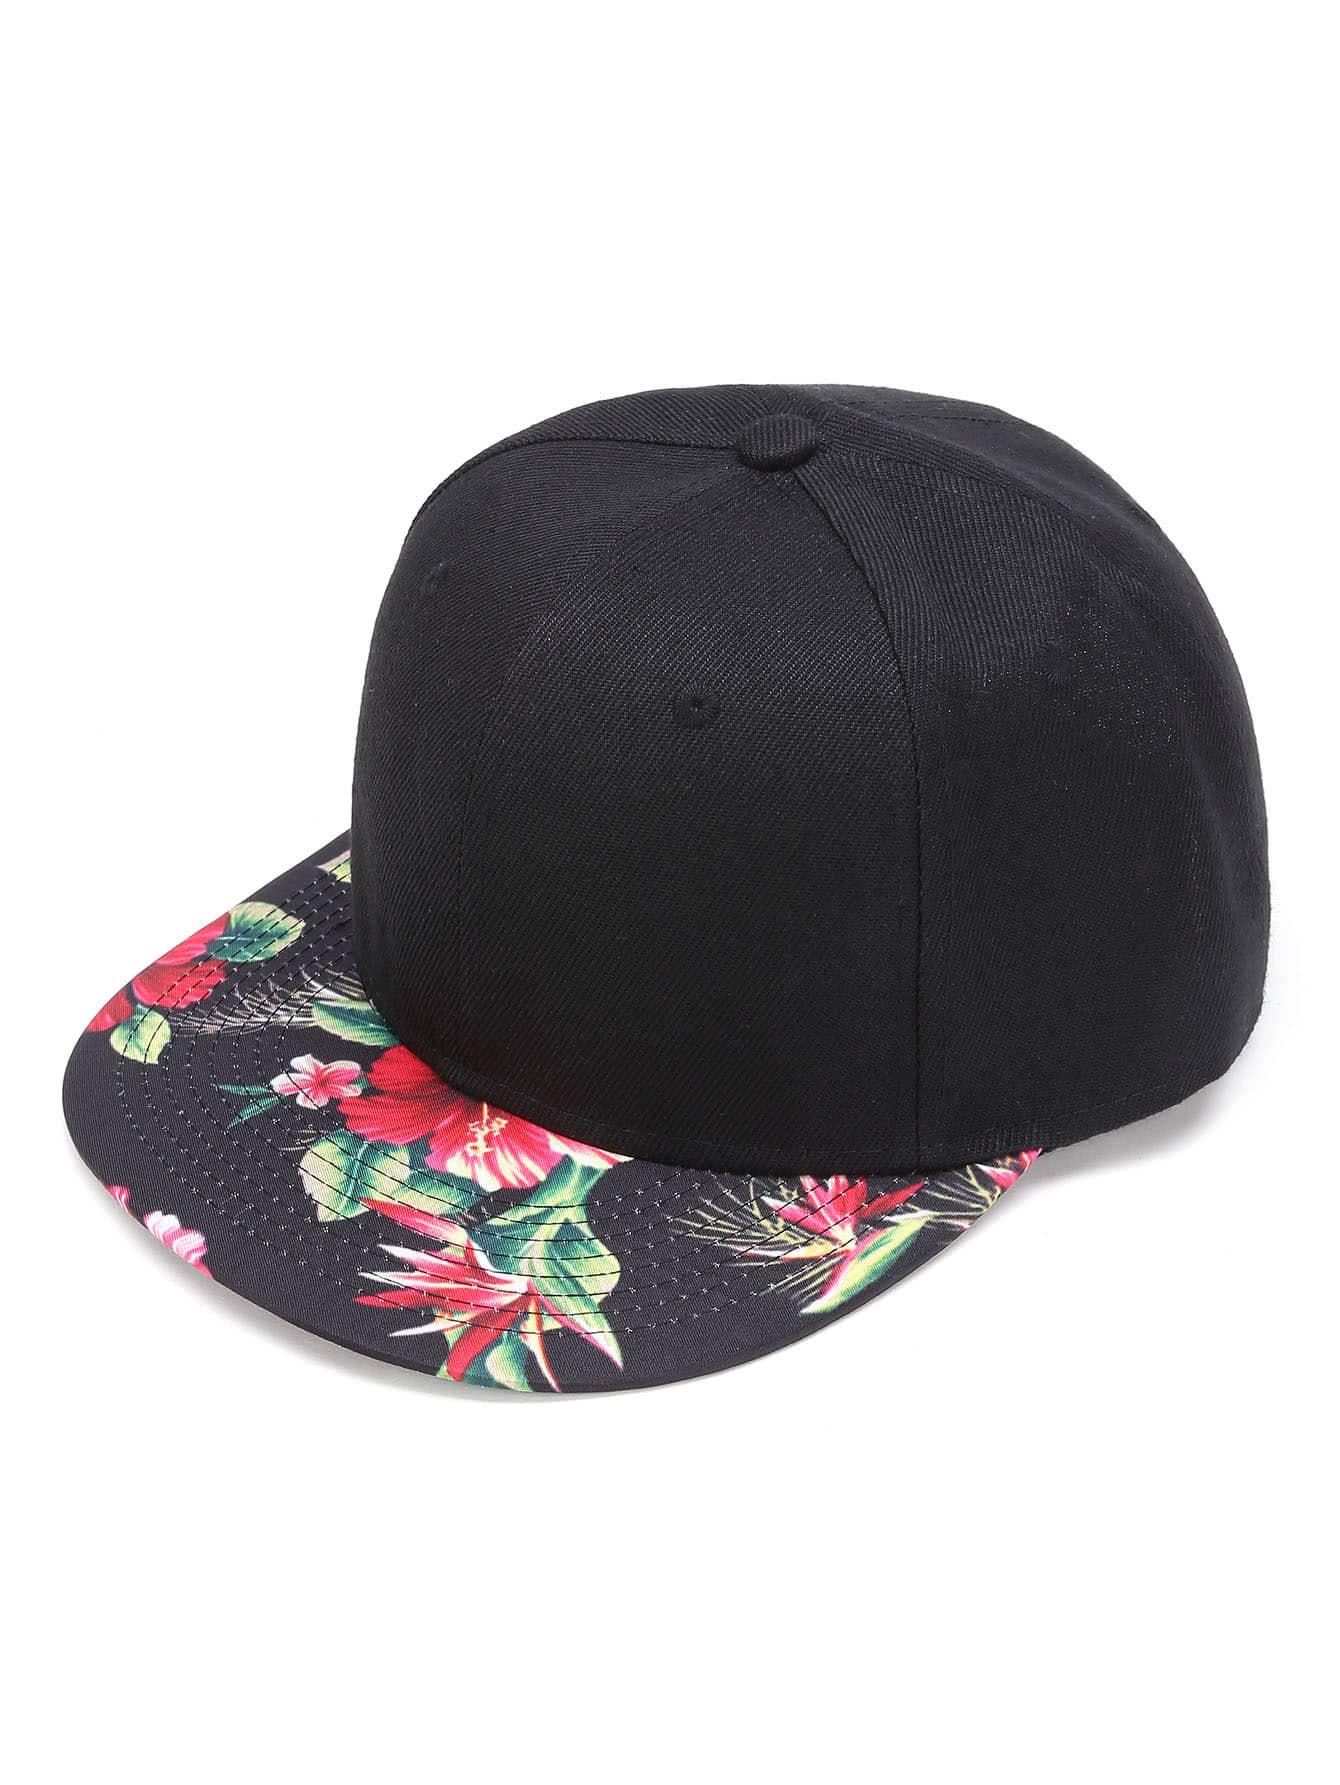 Какие кепки в моде фото